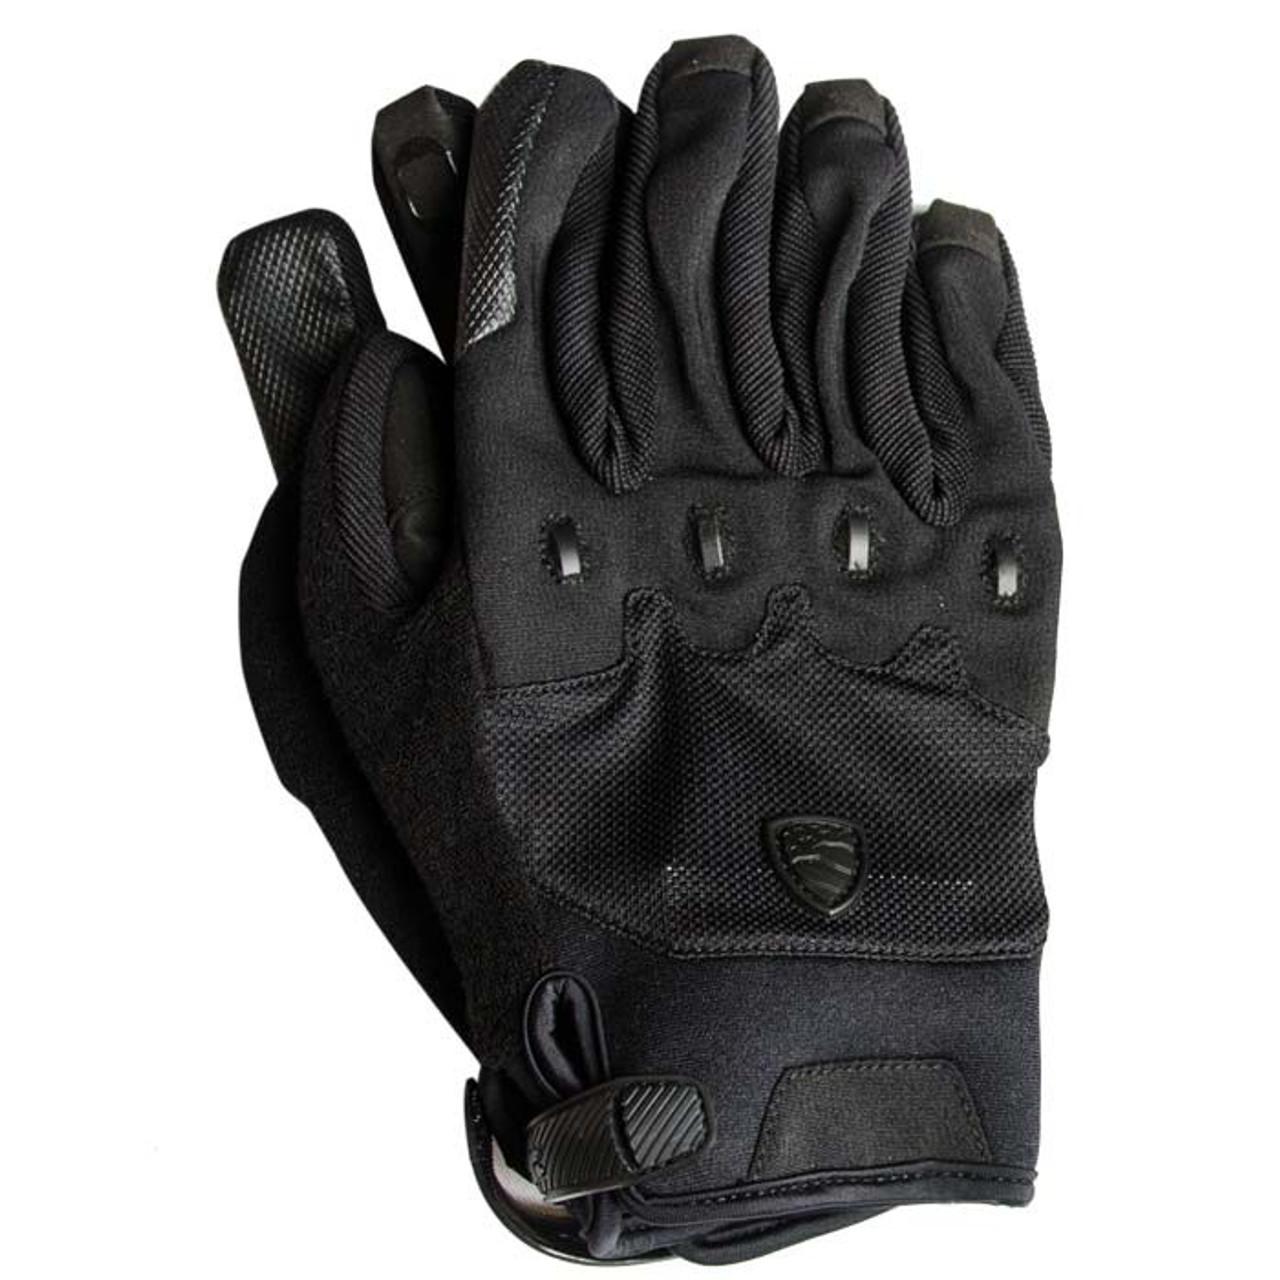 BLAUER RUMBLE BIKE GLOVE BLACK - Howard Uniform Company 9d848a18a